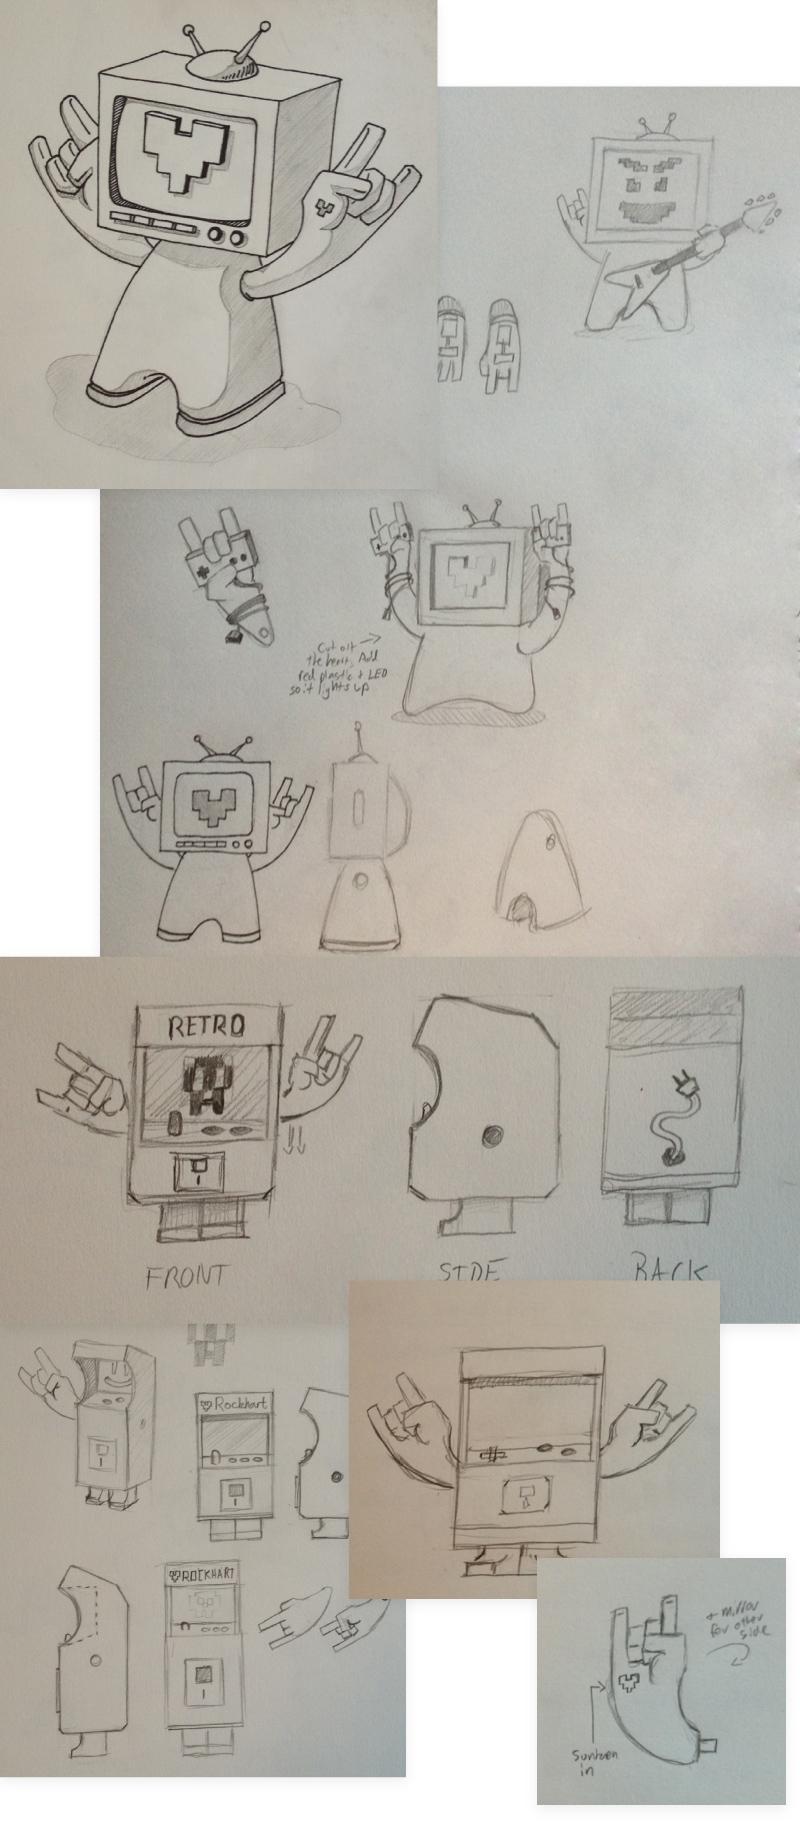 Rockade  - image 2 - student project